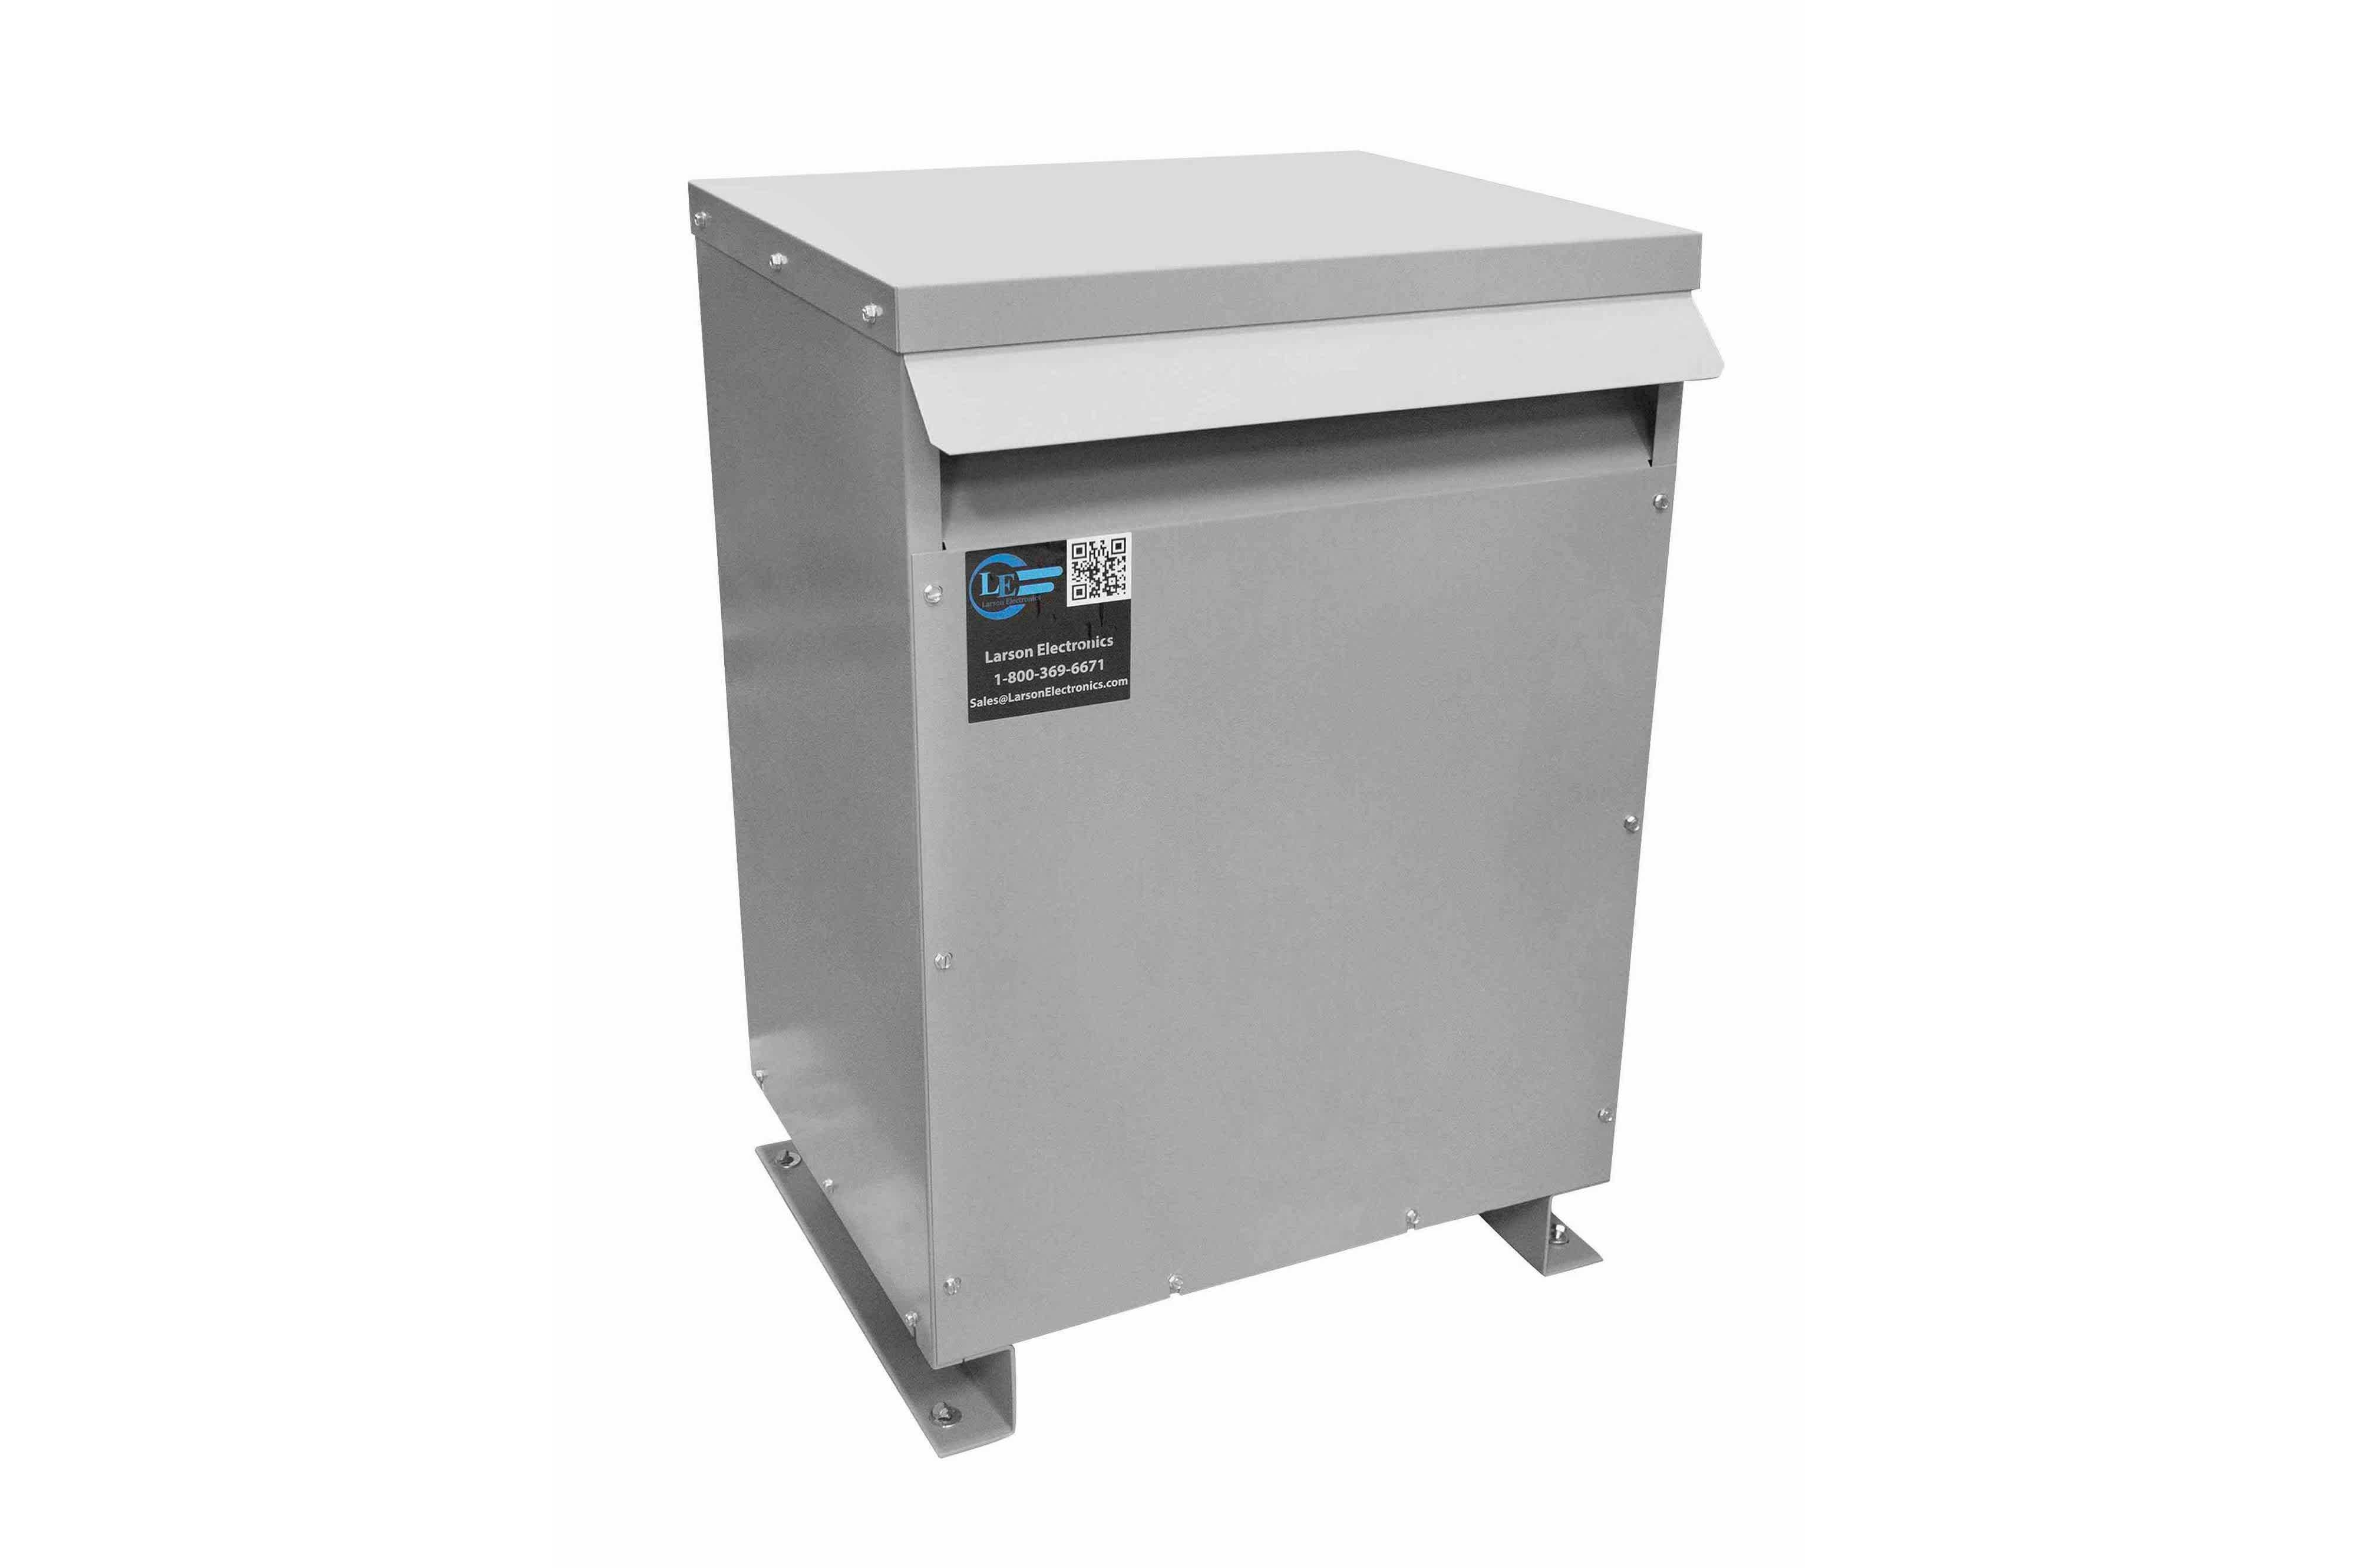 36 kVA 3PH Isolation Transformer, 480V Wye Primary, 400Y/231 Wye-N Secondary, N3R, Ventilated, 60 Hz